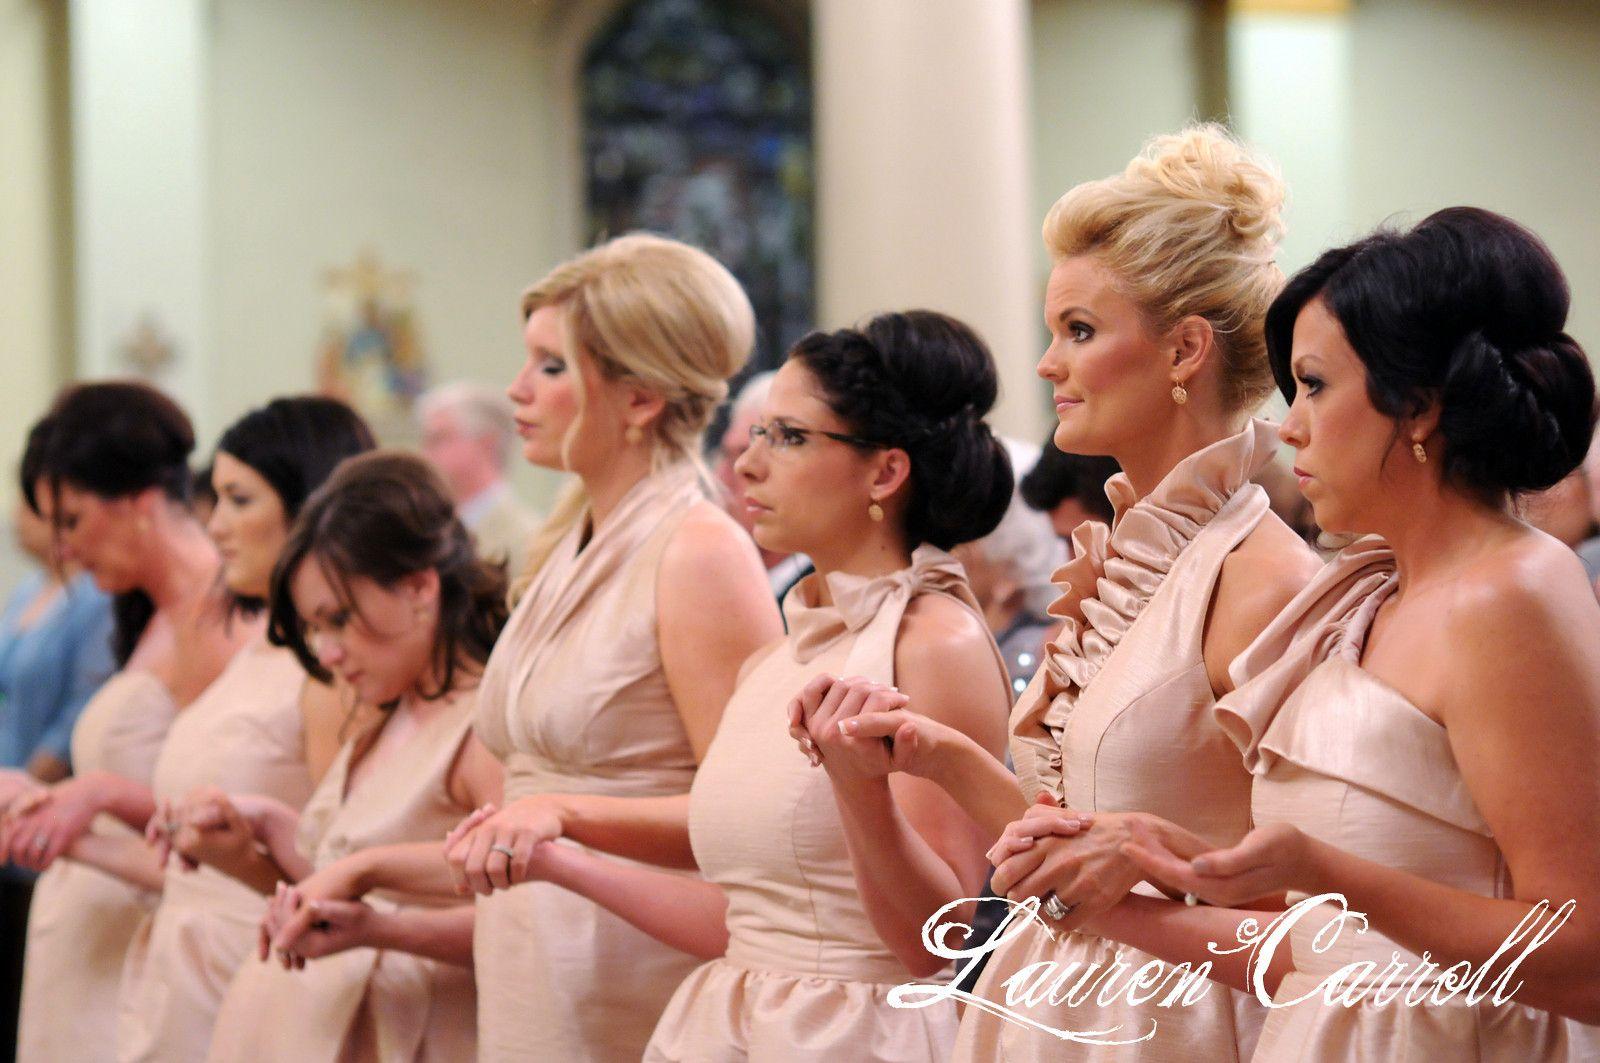 Bridesmaids praying in church laurencarrollphotography